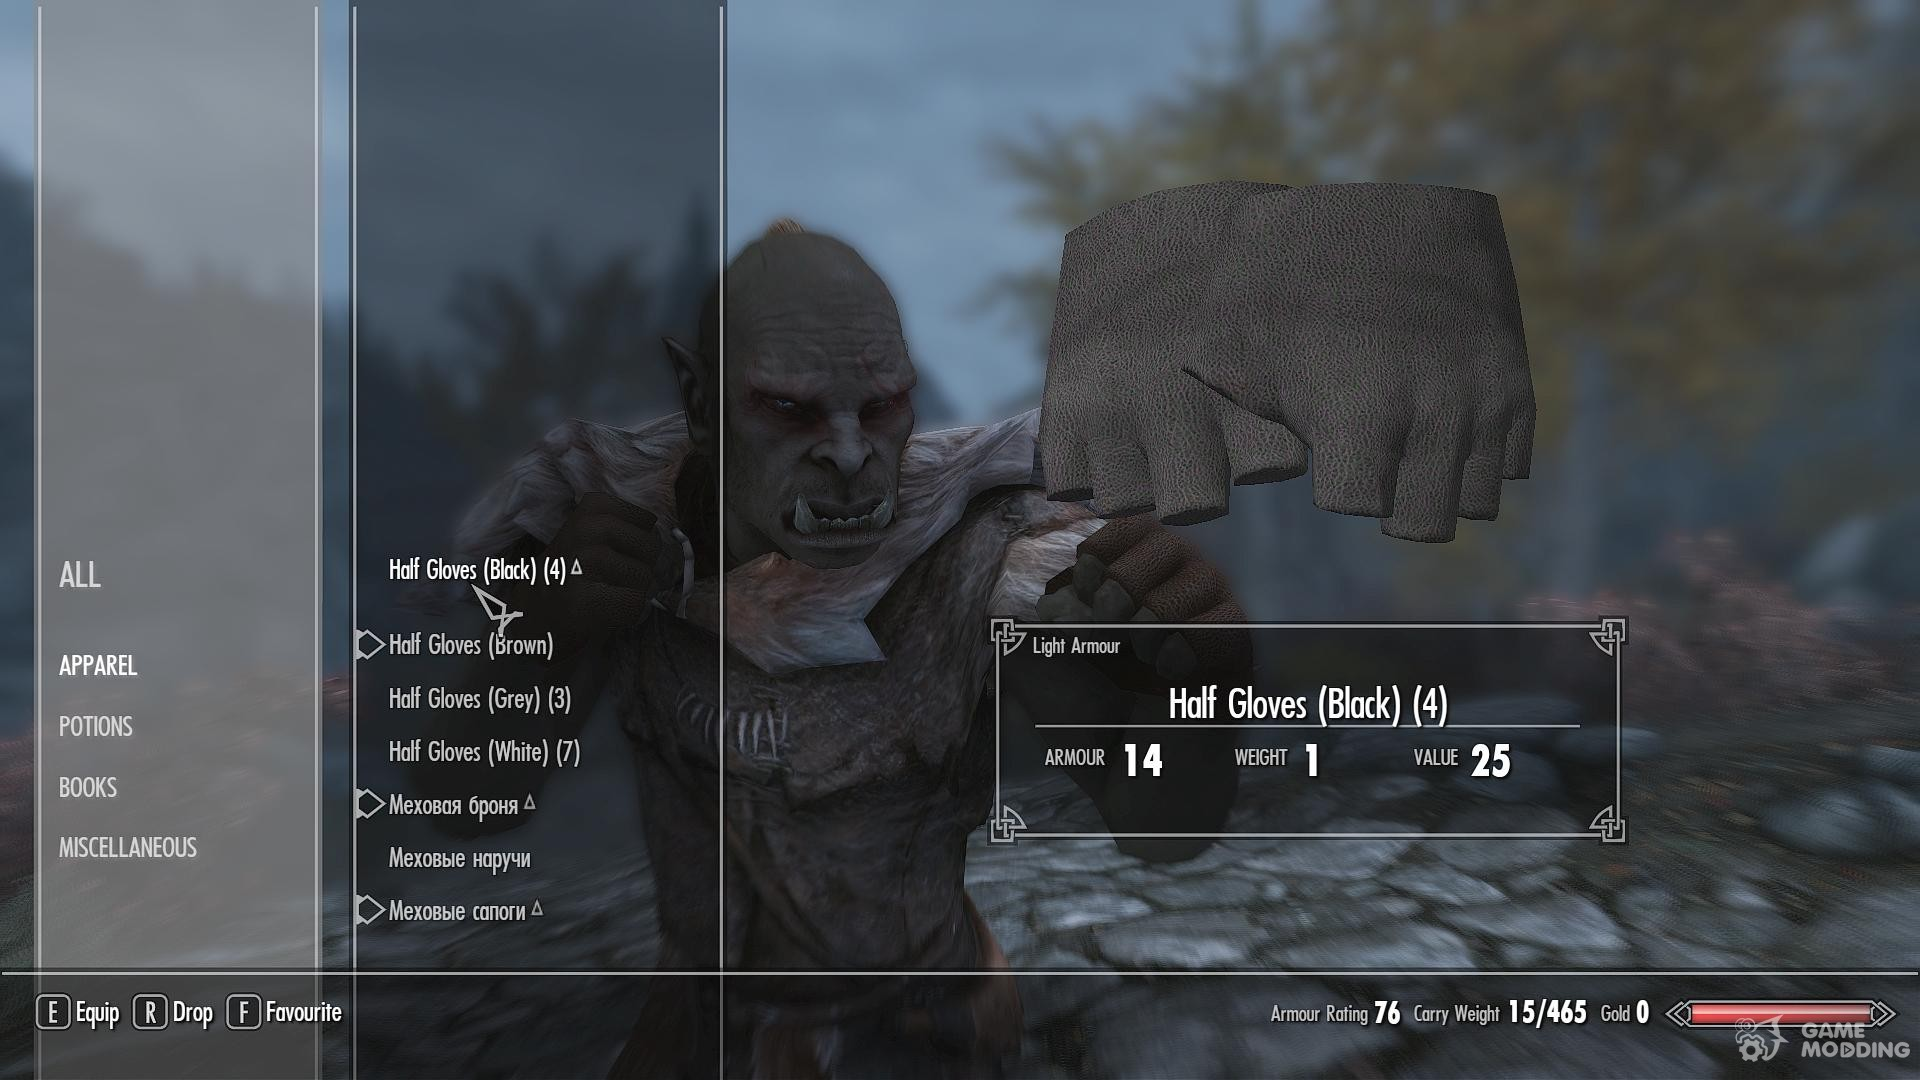 Half Gloves of Skyrim for TES V: Skyrim